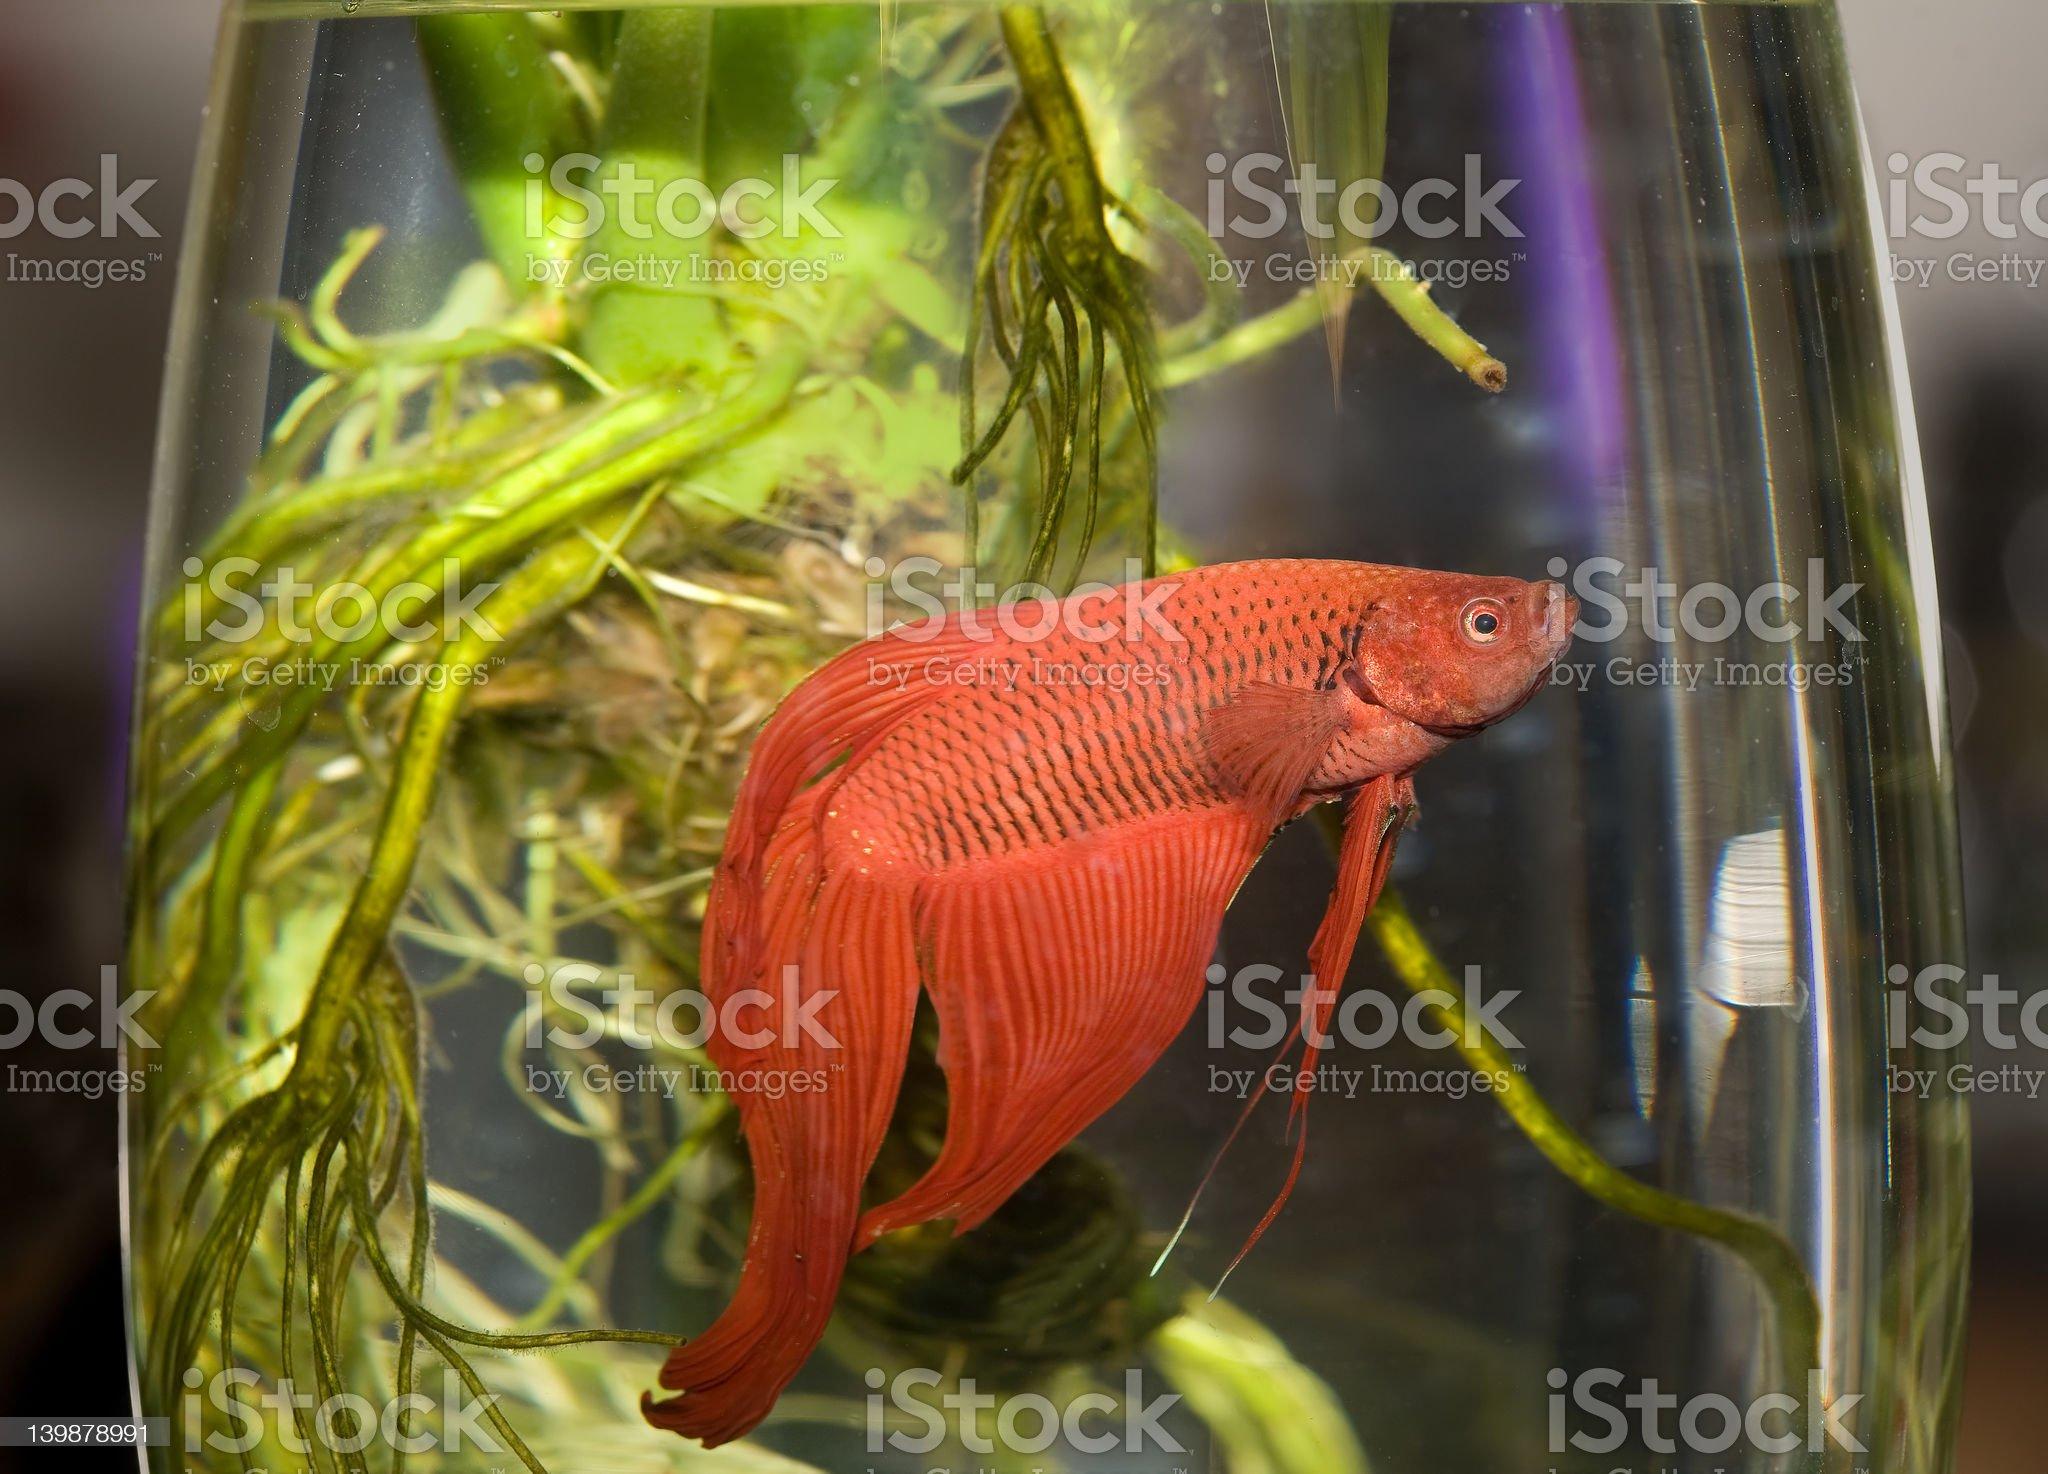 Siamese fighting fish (Betta splendens) royalty-free stock photo